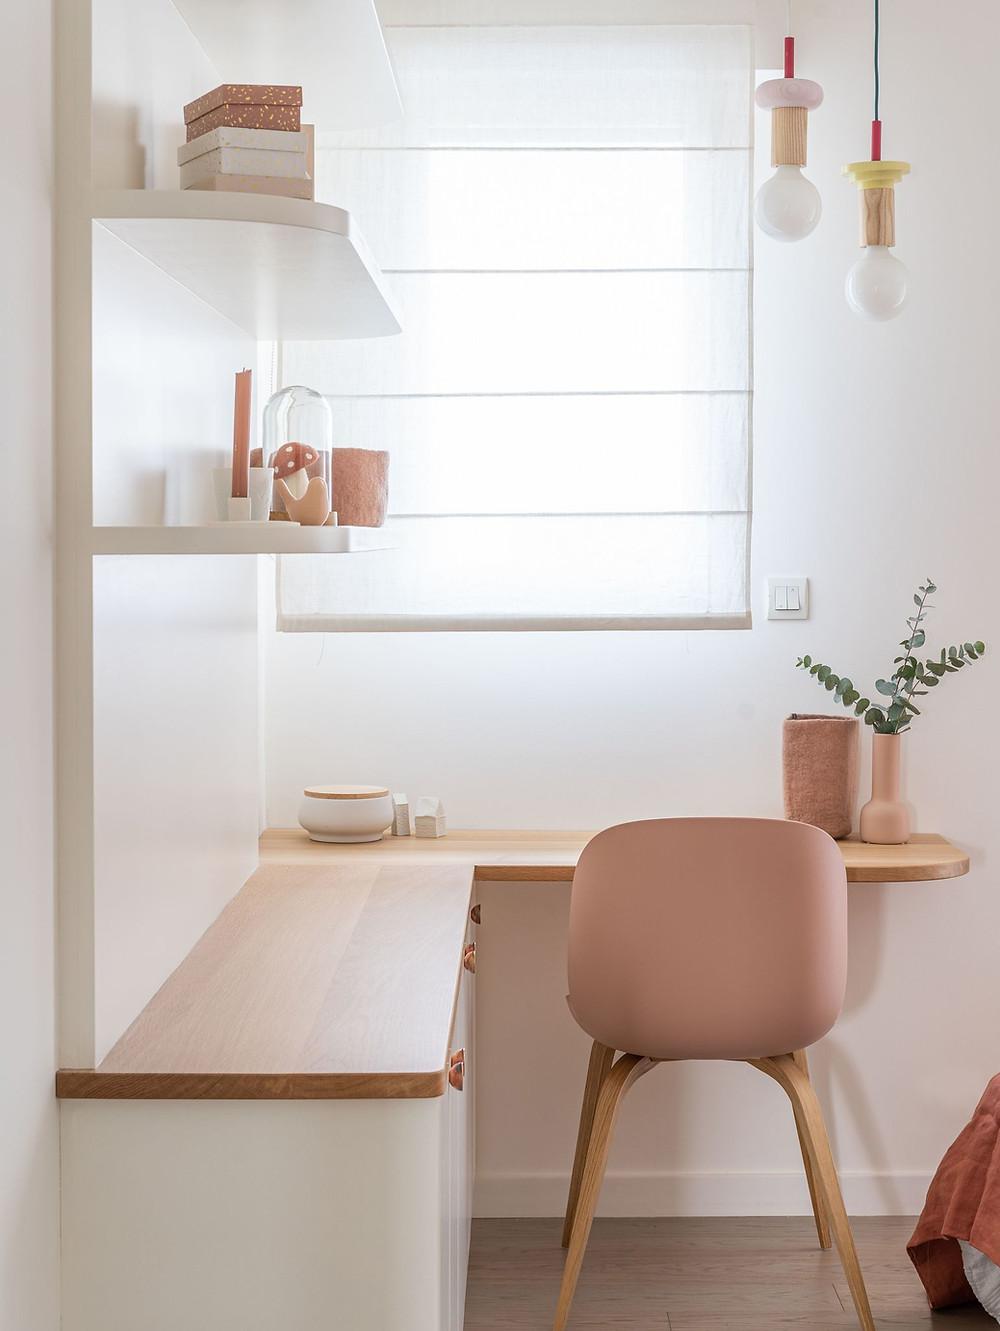 Design by: Adeline Pithois-Guillou (France)